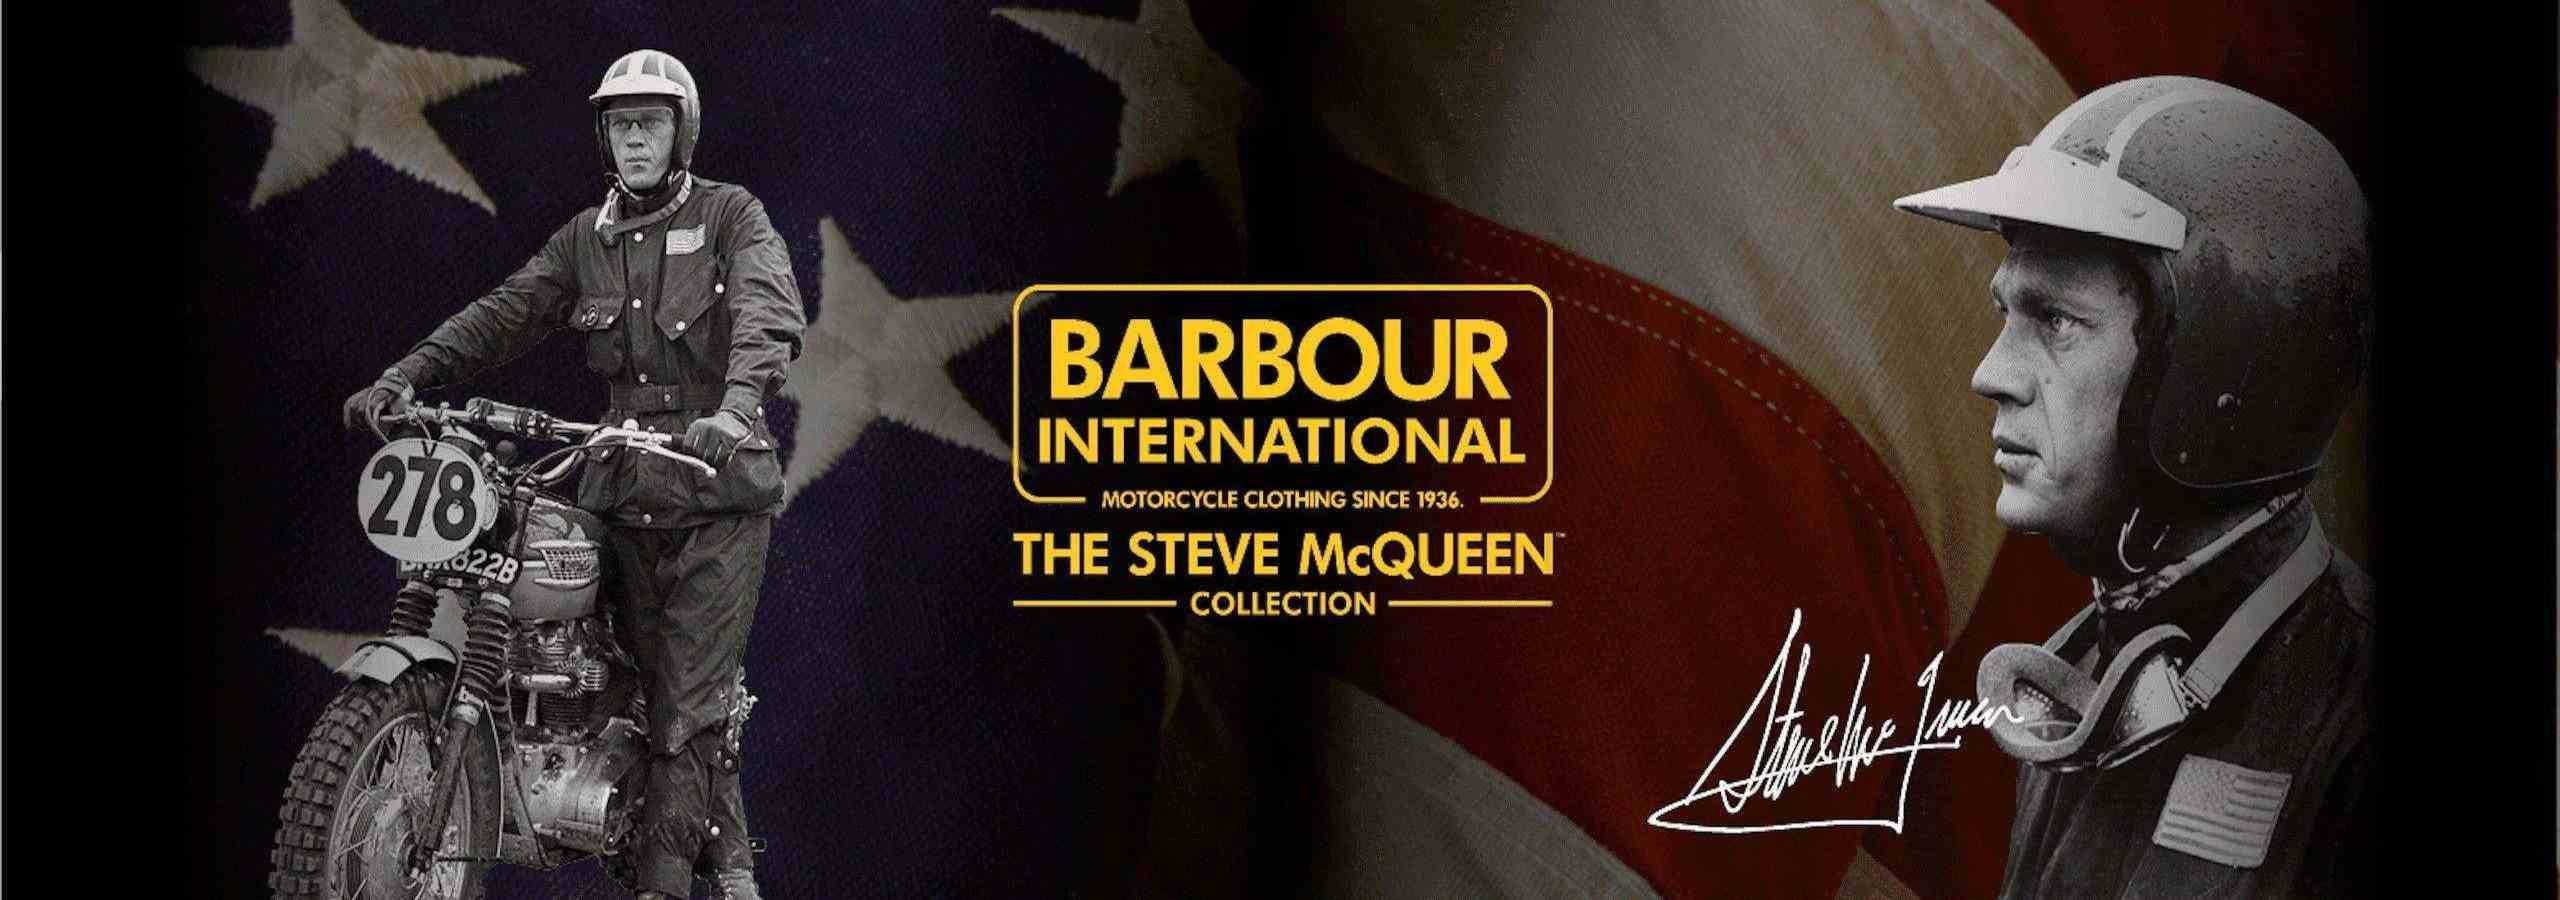 BARBOUR INTERNATIONAL STEVE MCQUEEN COLLECTION